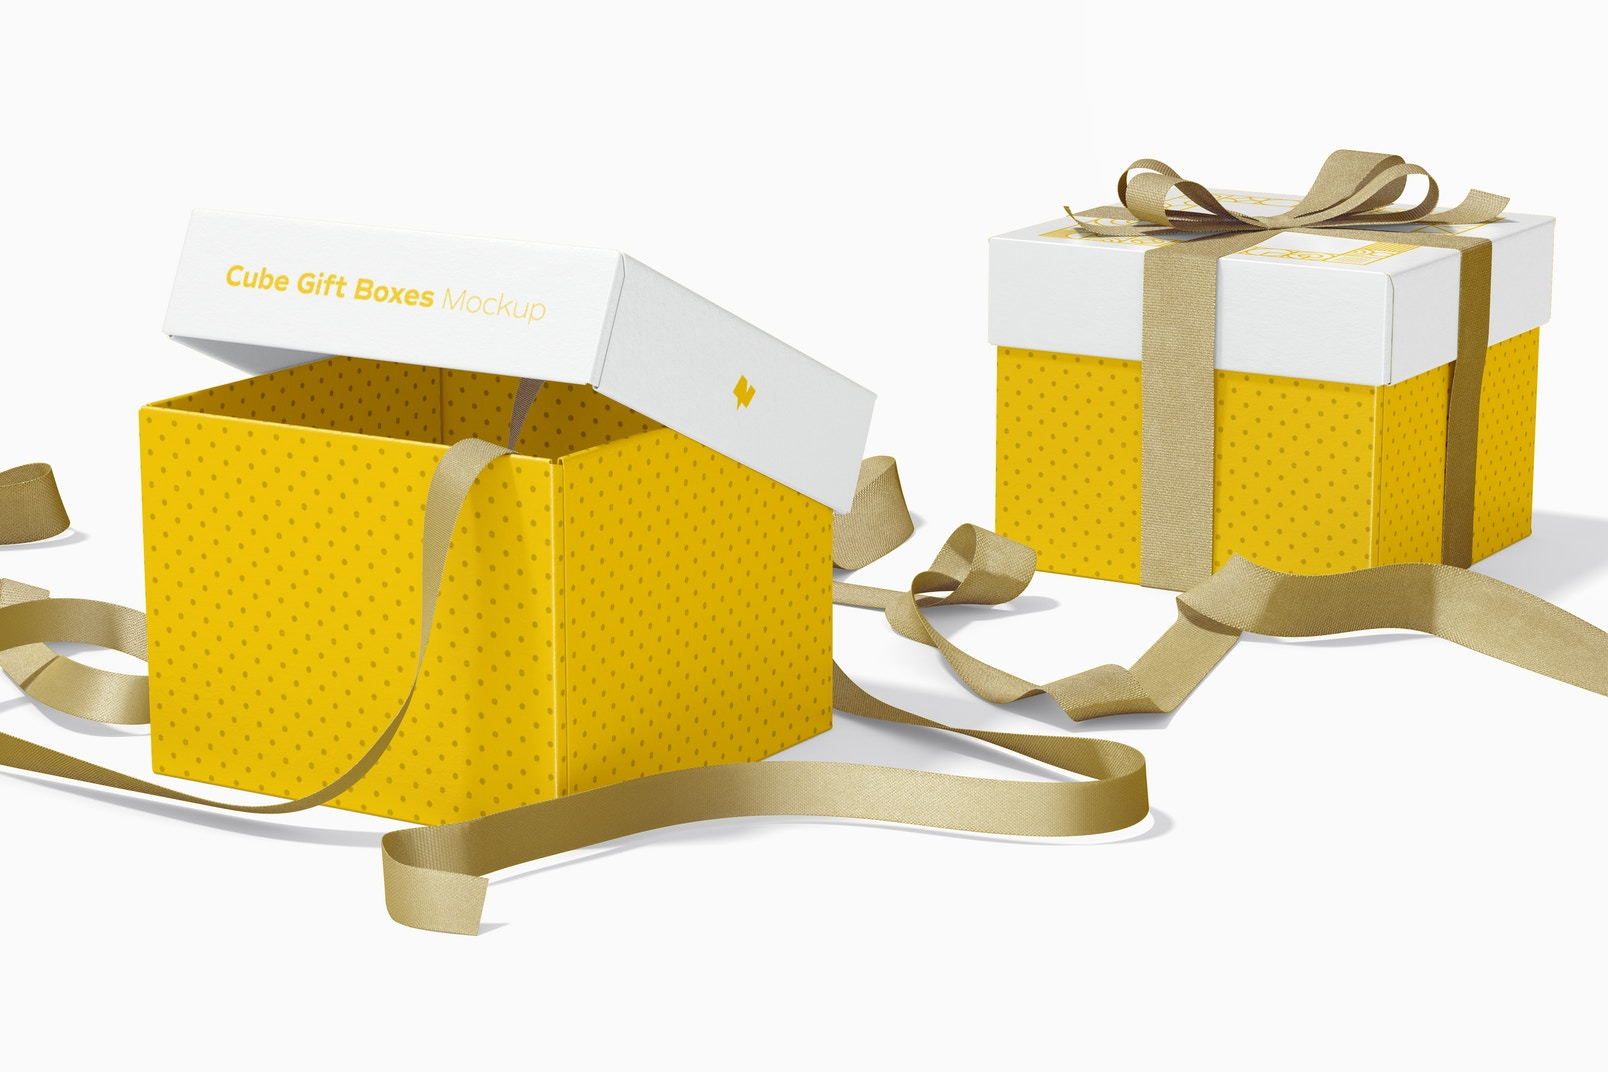 Cube Gift Boxes With Ribbon Mockup